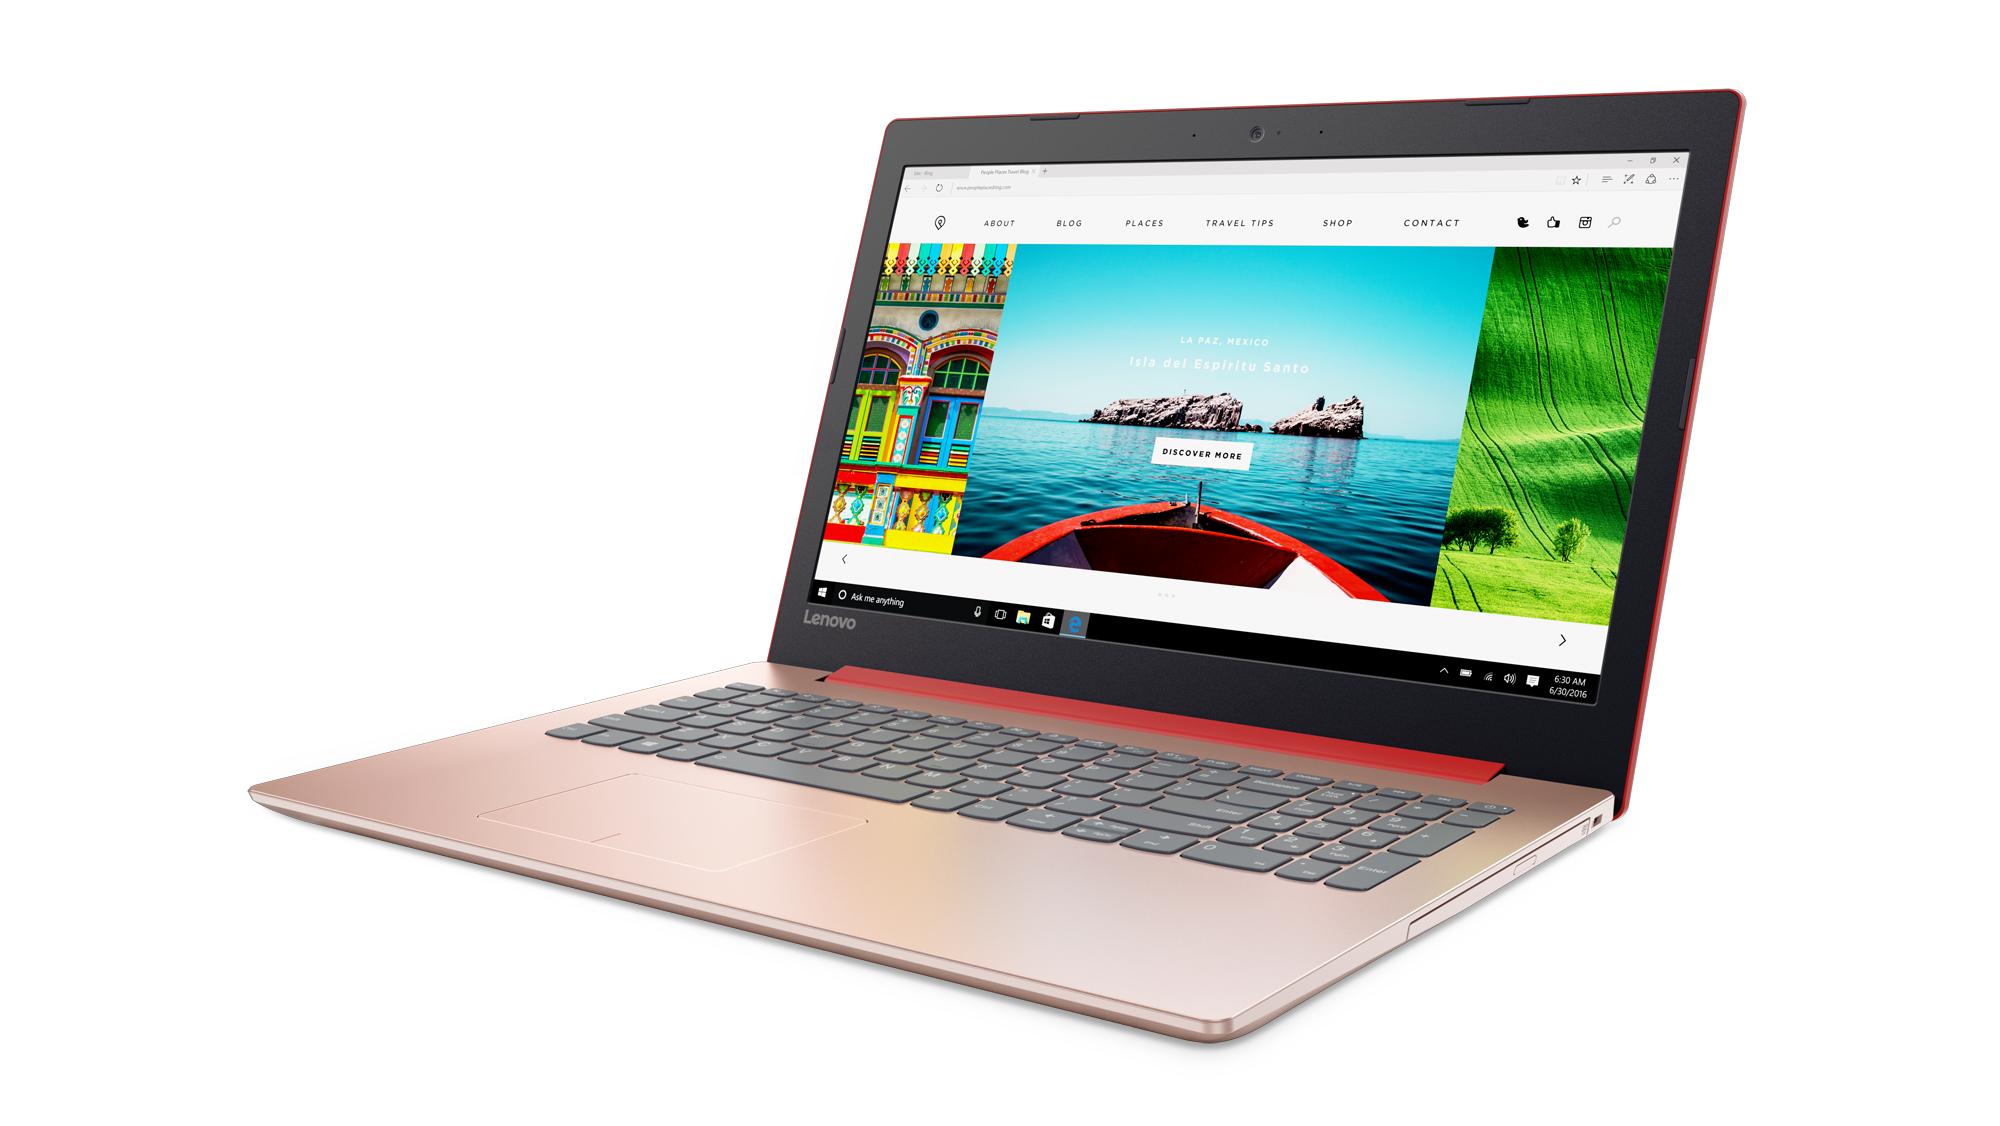 "Lenovo IdeaPad 320-15IKBN i5-7200U 3,10GHz/8GB/SSD 256GB/15,6"" FHD/AG/GeForce 2GB/WIN10 červená 80XL0075CK"